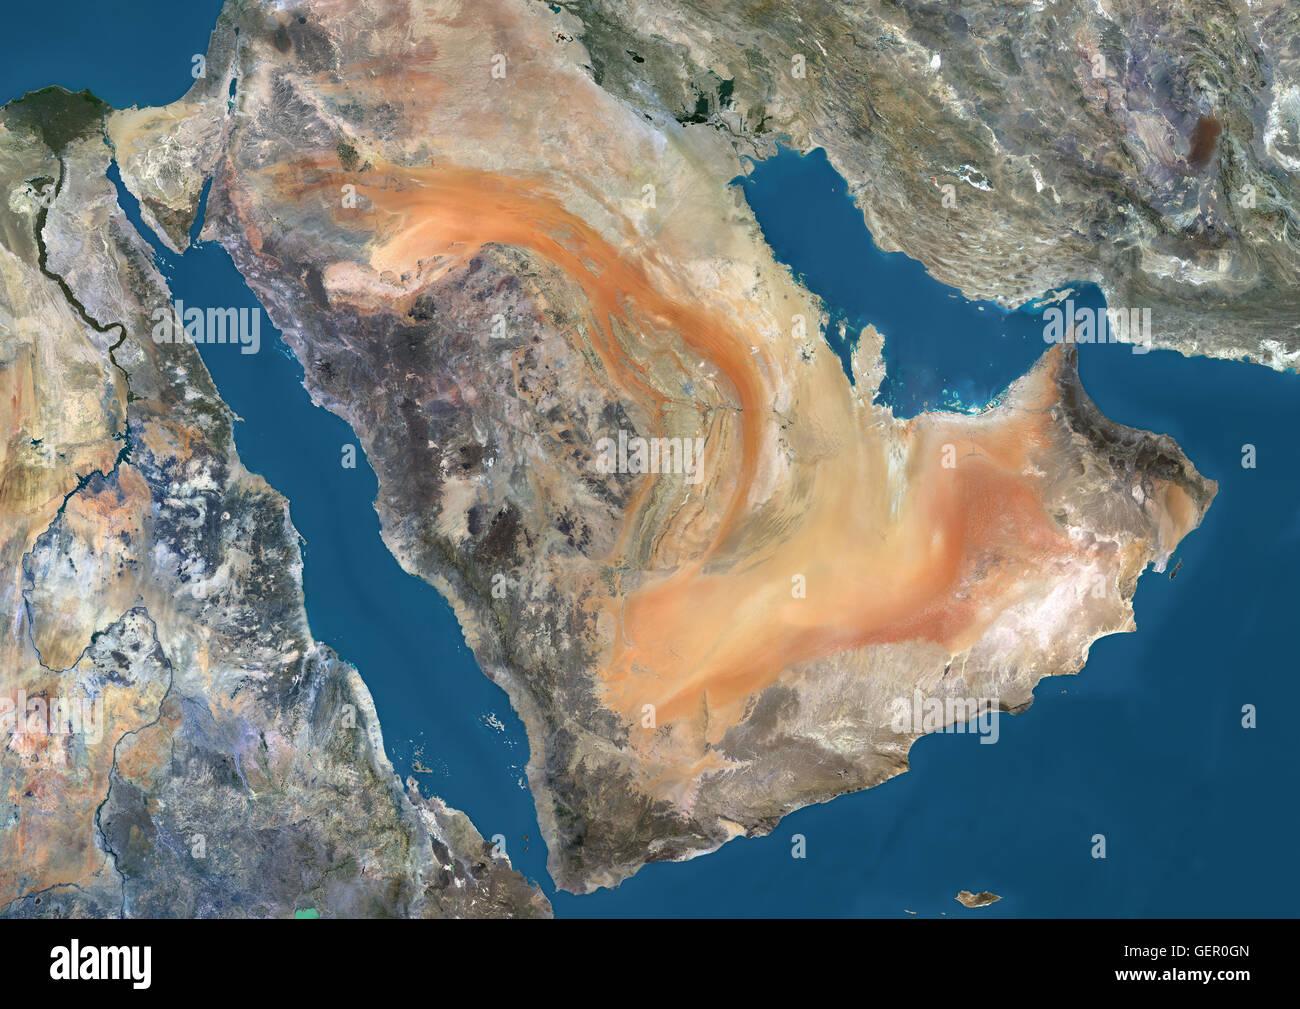 Satellite View Of The Arabian Peninsula This Image Was